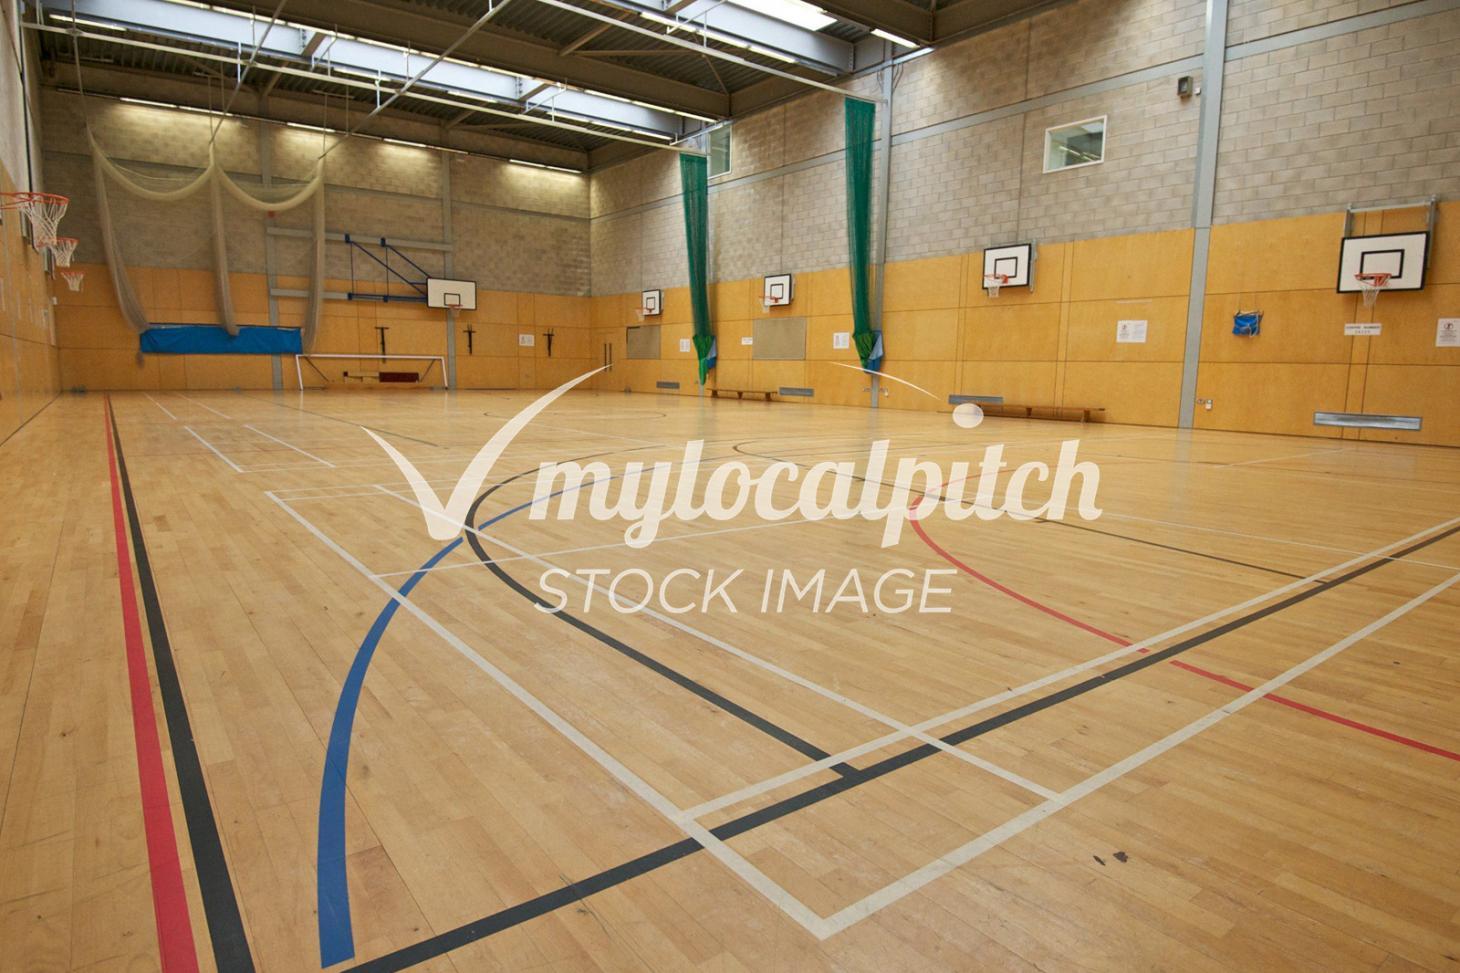 The Holy Cross School Indoor basketball court